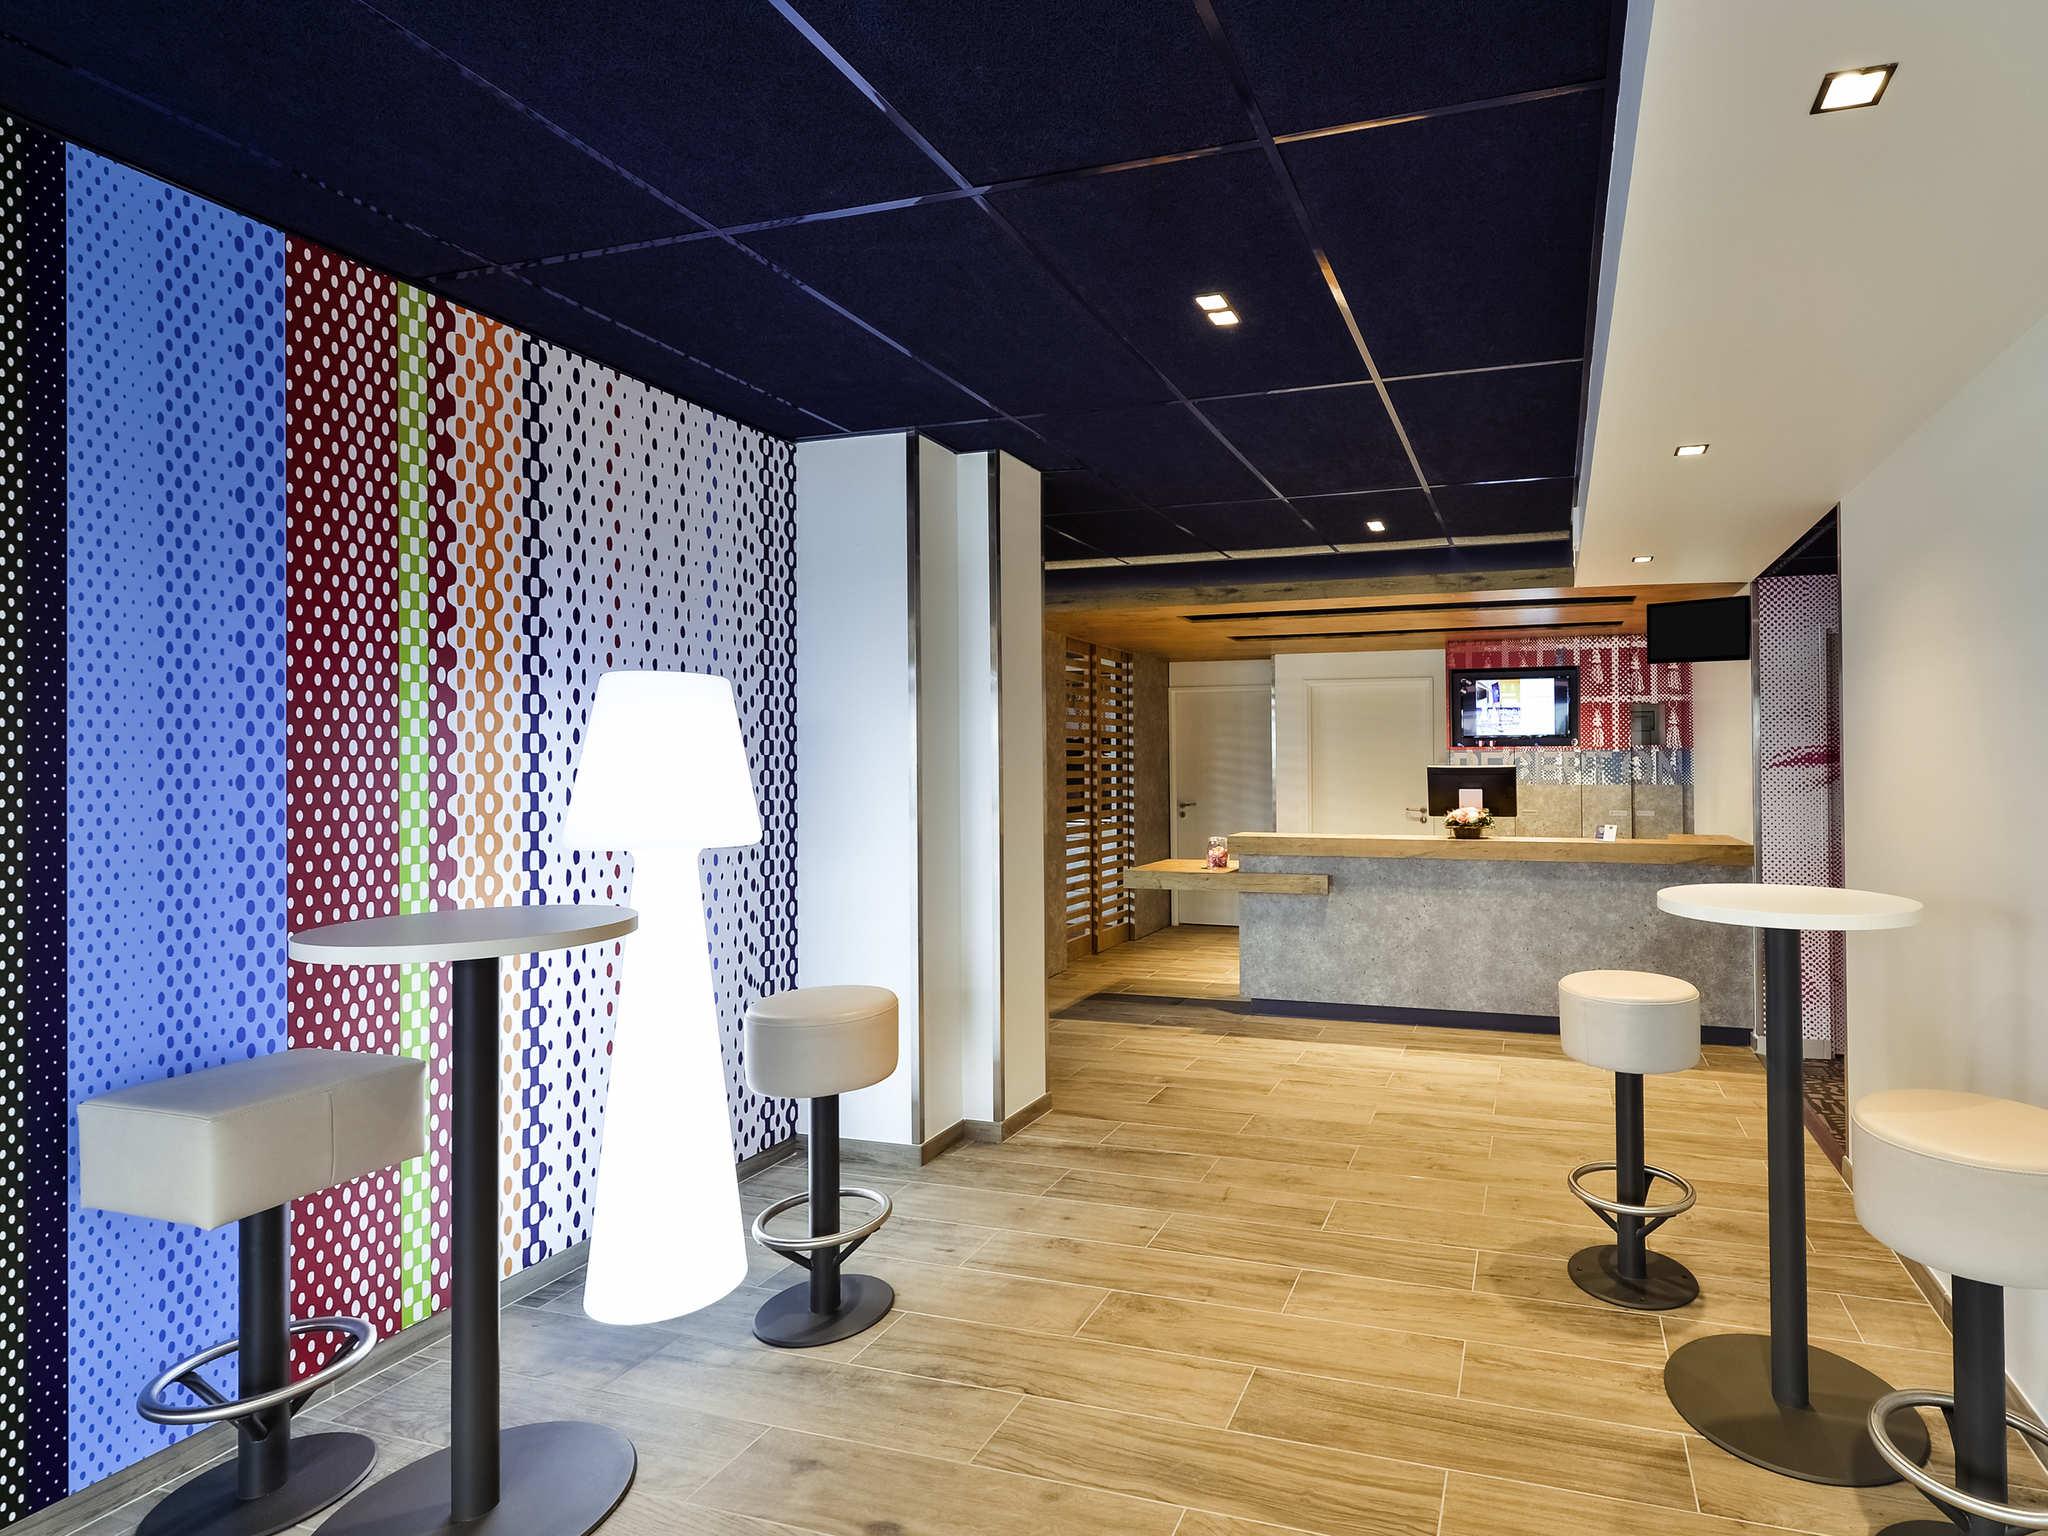 Hotel – ibis budget Macon Creches (abre em maio de 2018)